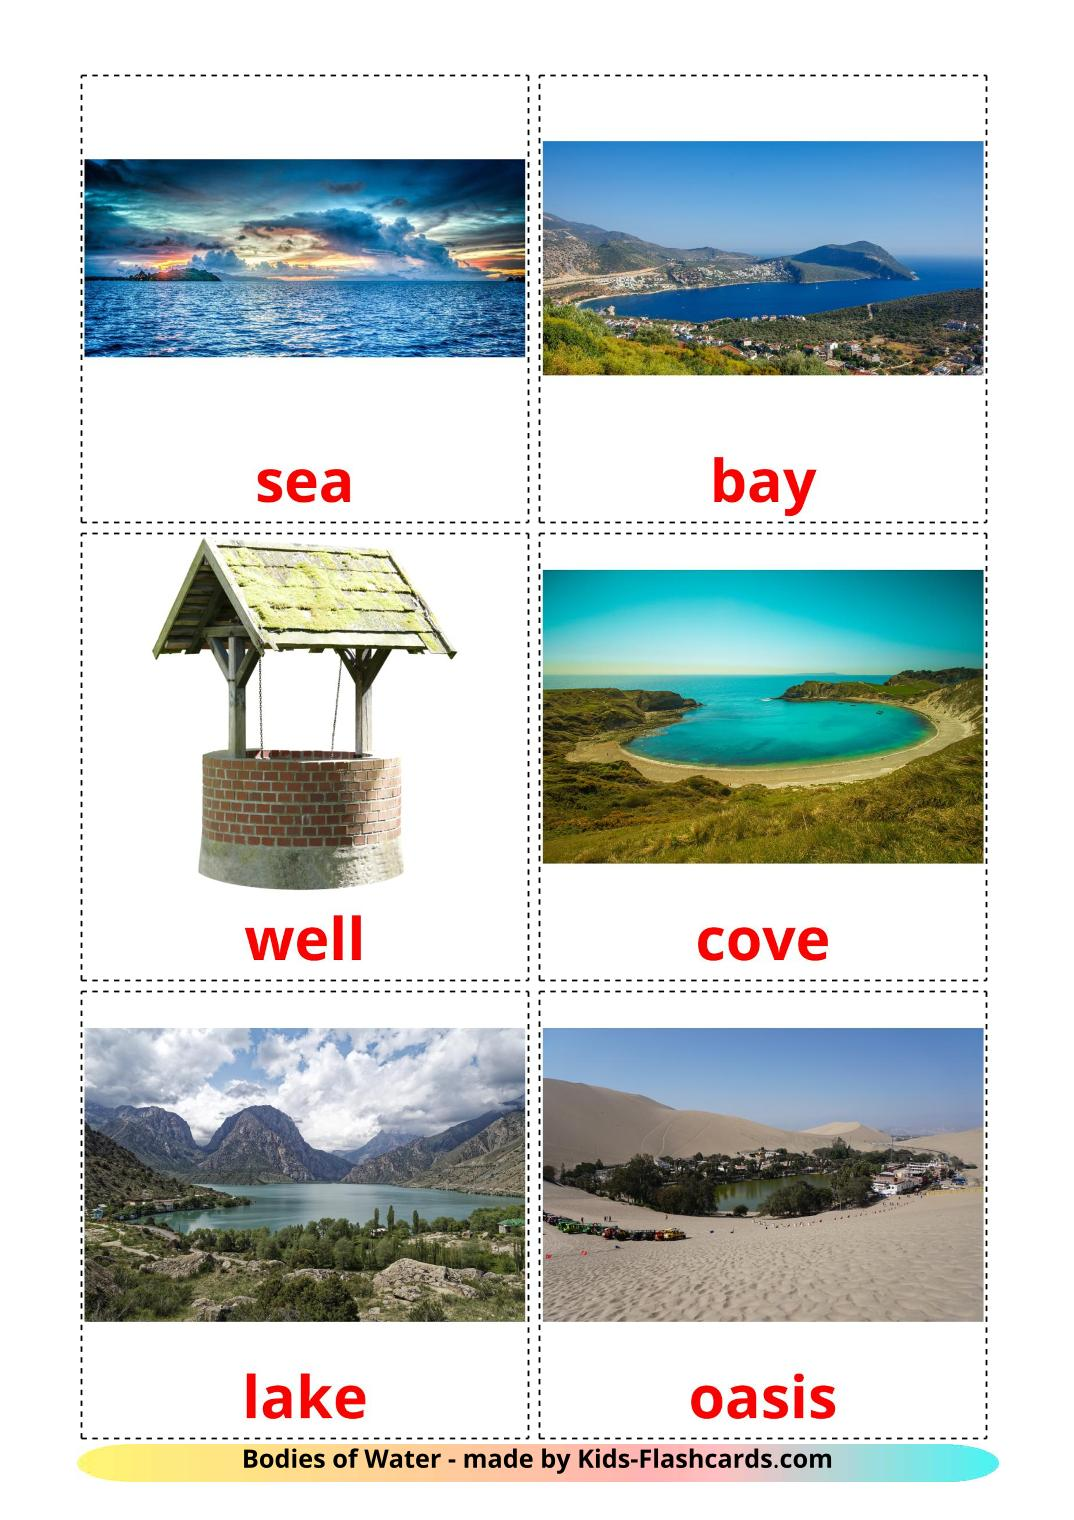 Bodies of Water - 30 Free Printable english Flashcards